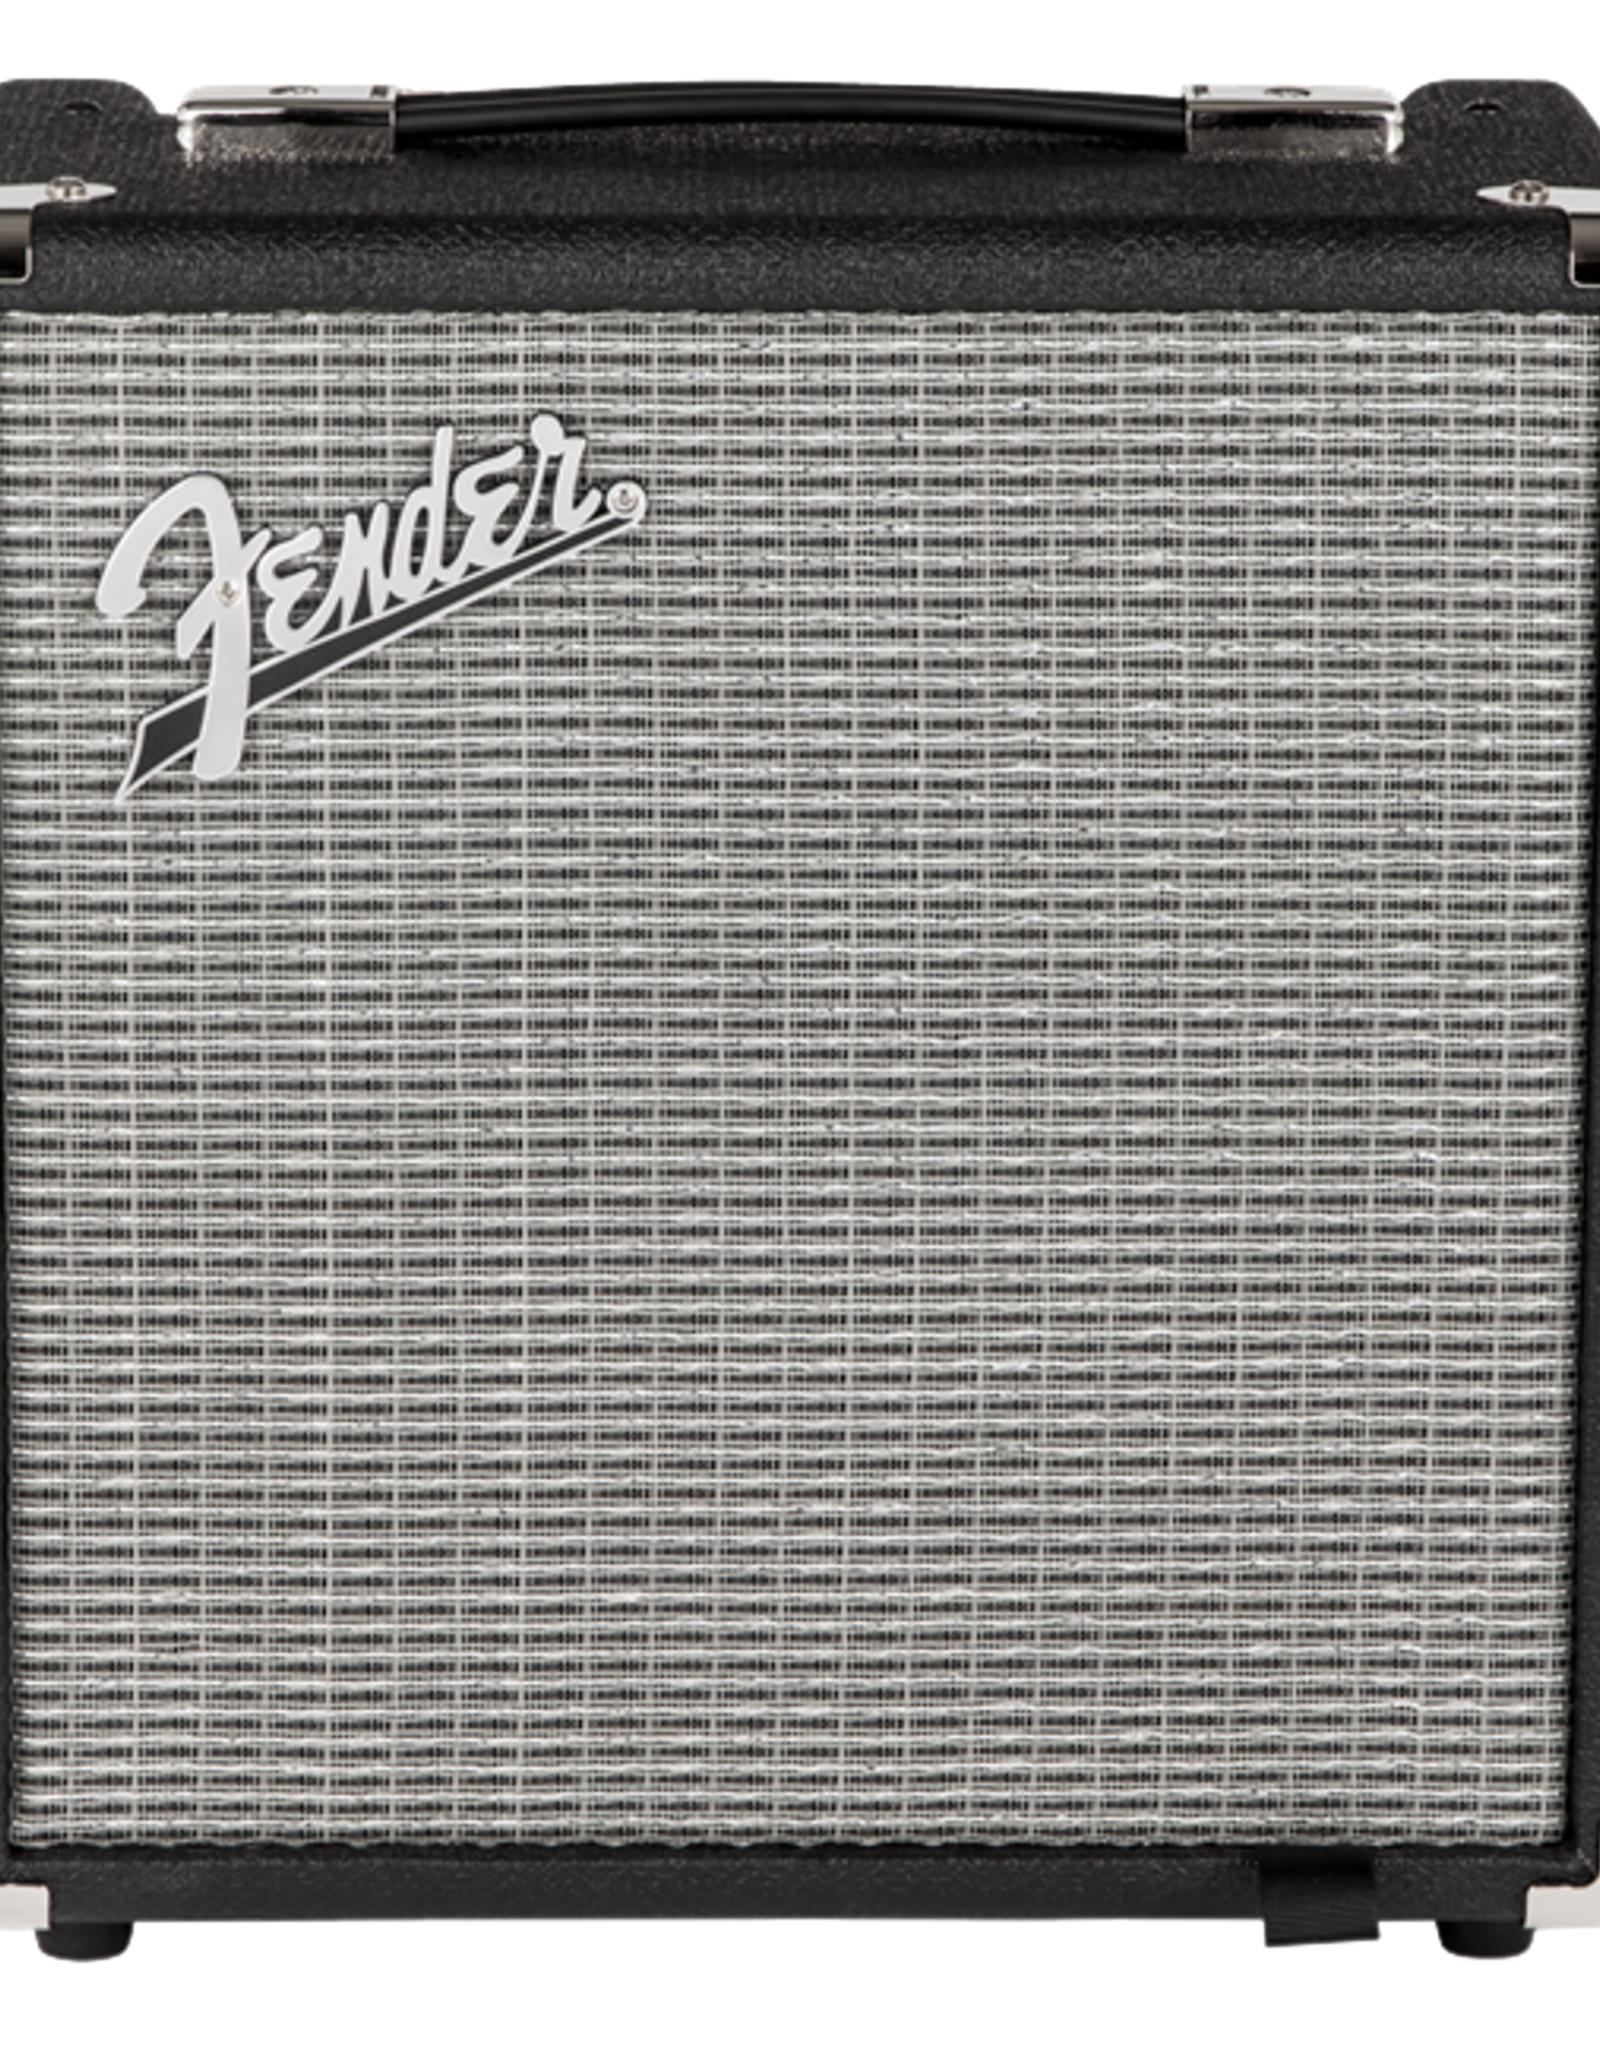 Fender Fender Rumble 15 (V3), 120V, Black/Silver